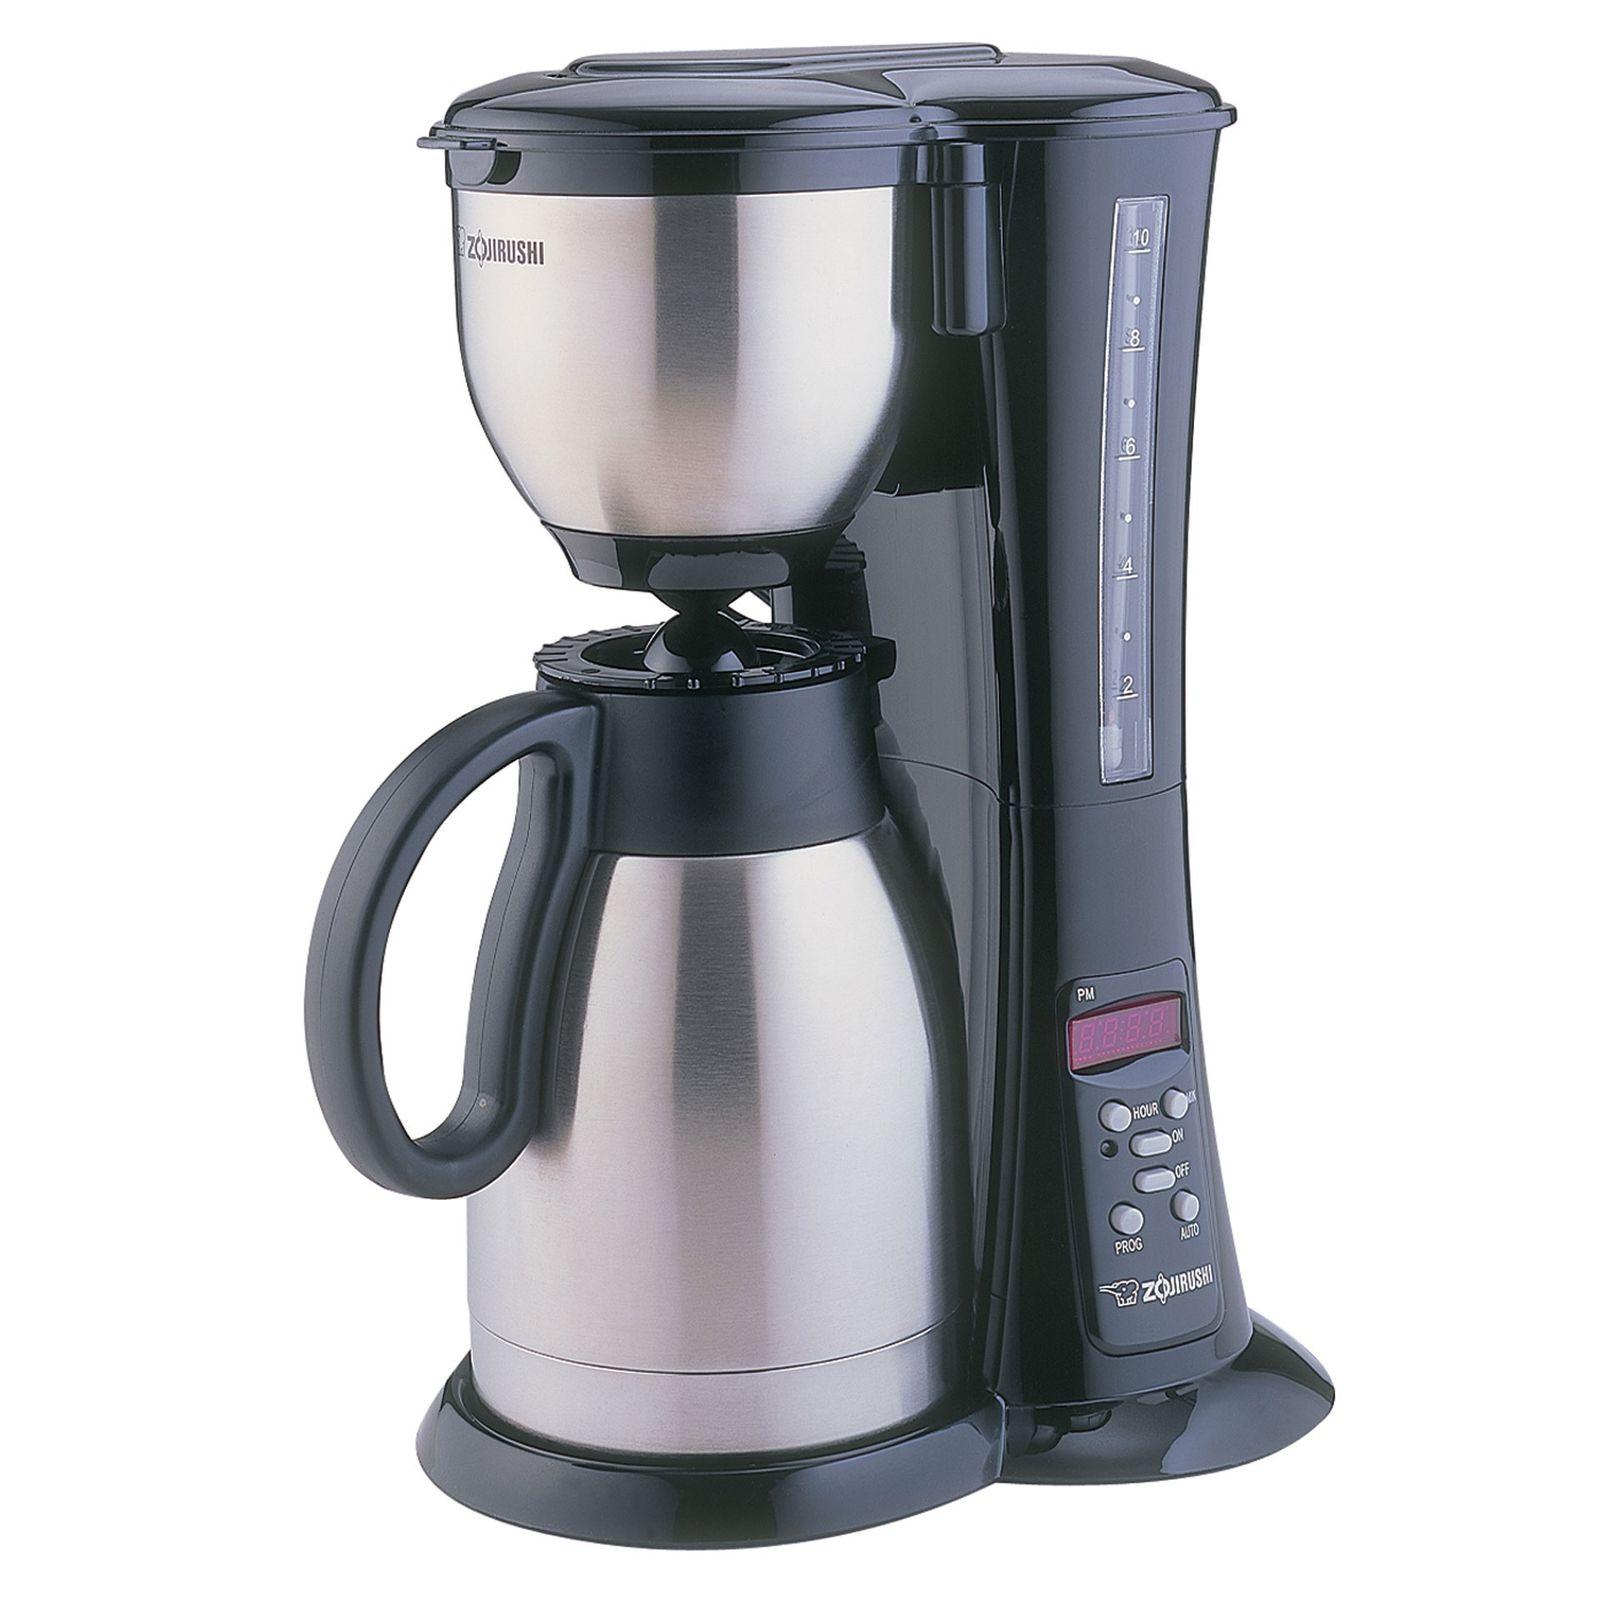 Good Housekeeping Coffee Maker Ratings : Zojirushi Fresh Brew Stainless Steel Thermal Carafe Coffee Maker #EC-BD15 Review